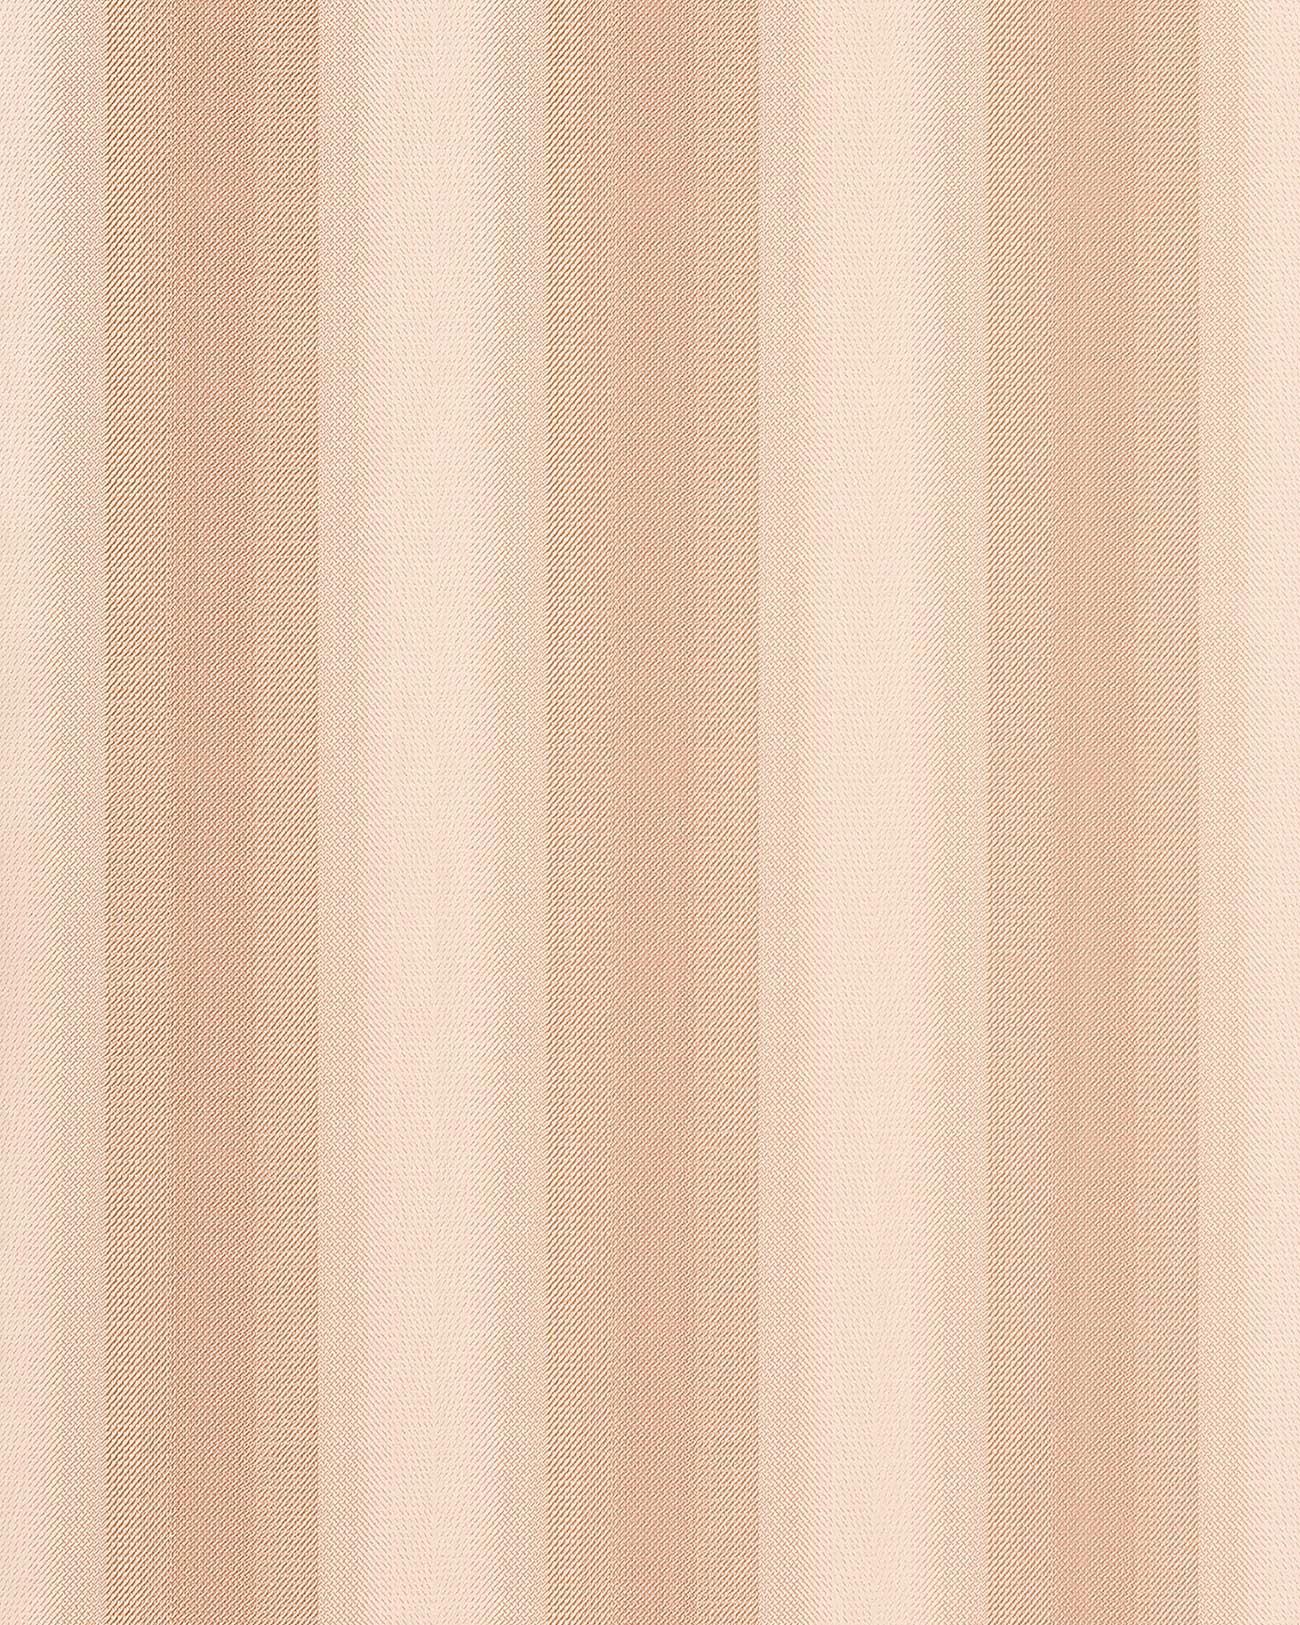 Strepen behang design behangpapier edem 085 23 vinyl roodbruin ...